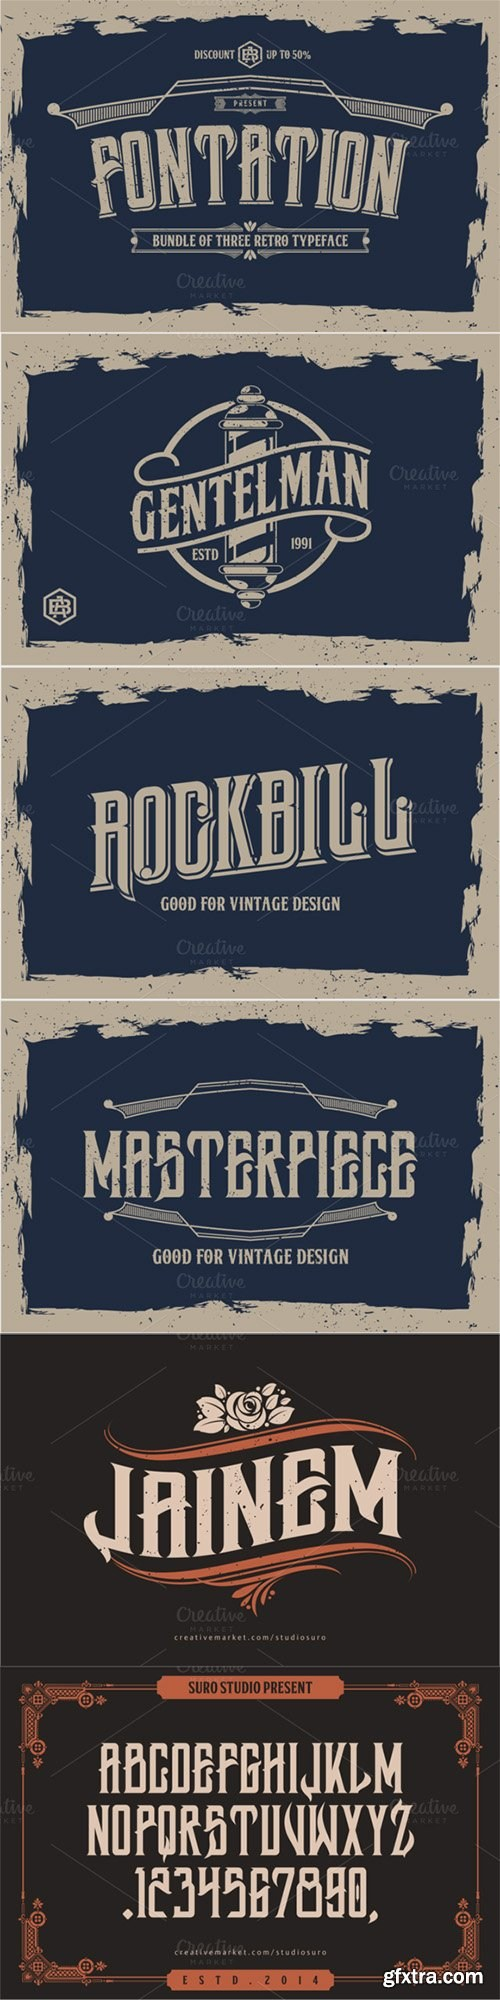 Creativemarket_FONTATION_Bundle_of_3_Retro_Typeface_299044_cap01